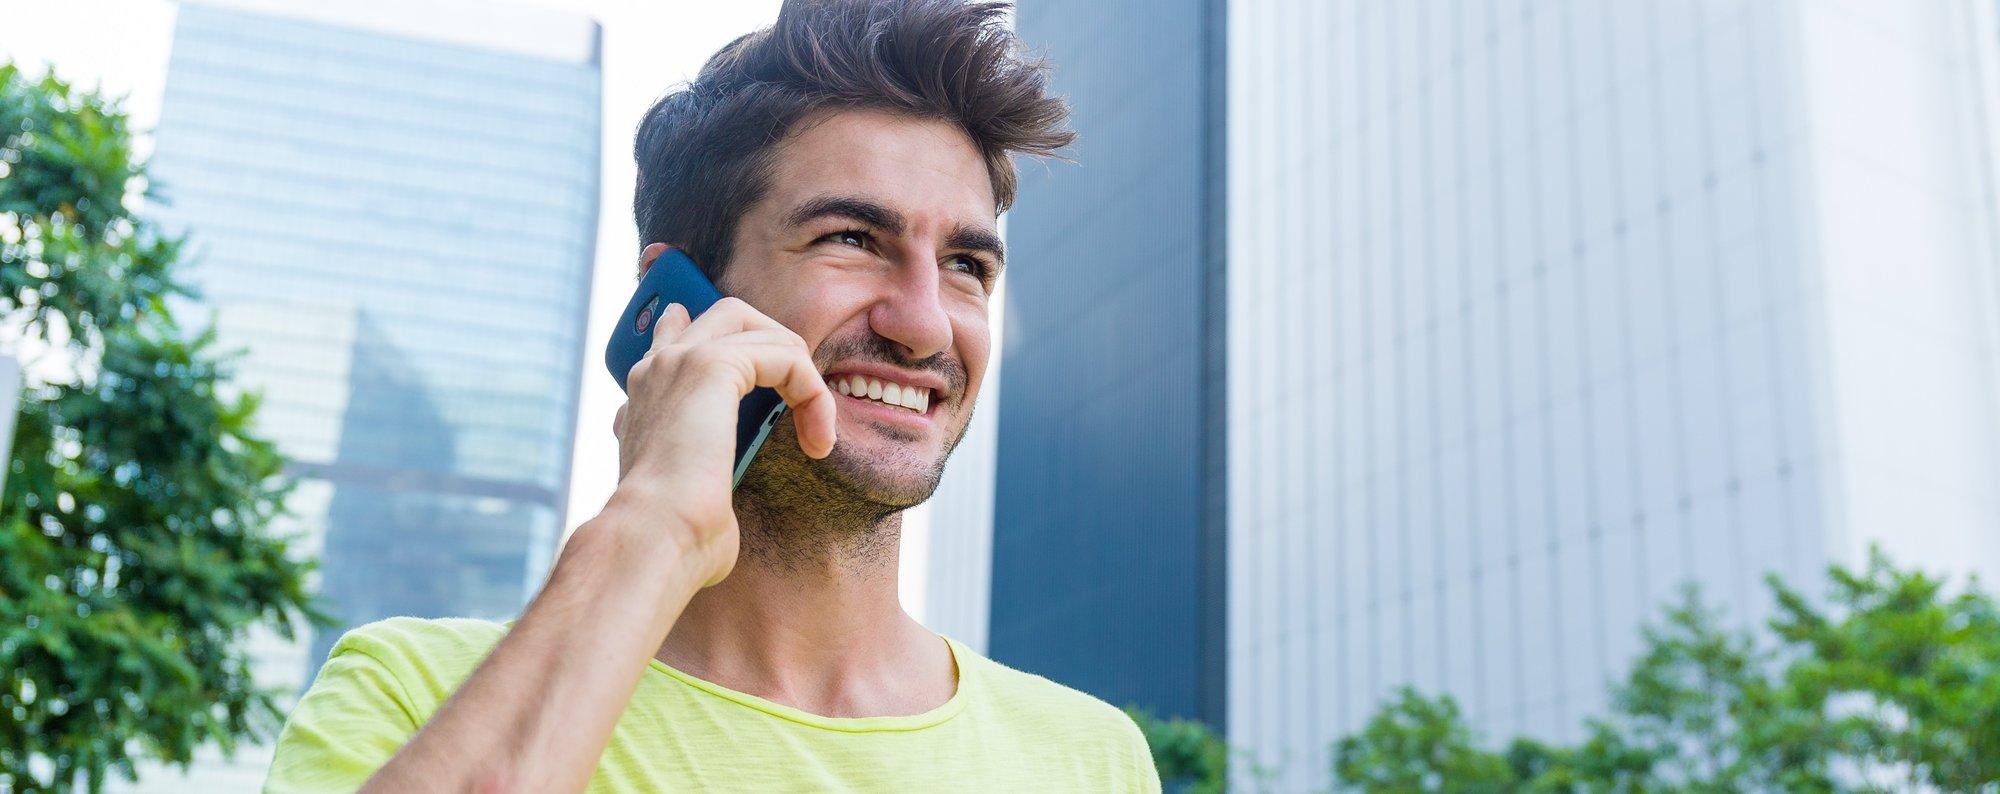 caucasian-man-talk-to-cellphone-at-outdoor-2TS7WEM